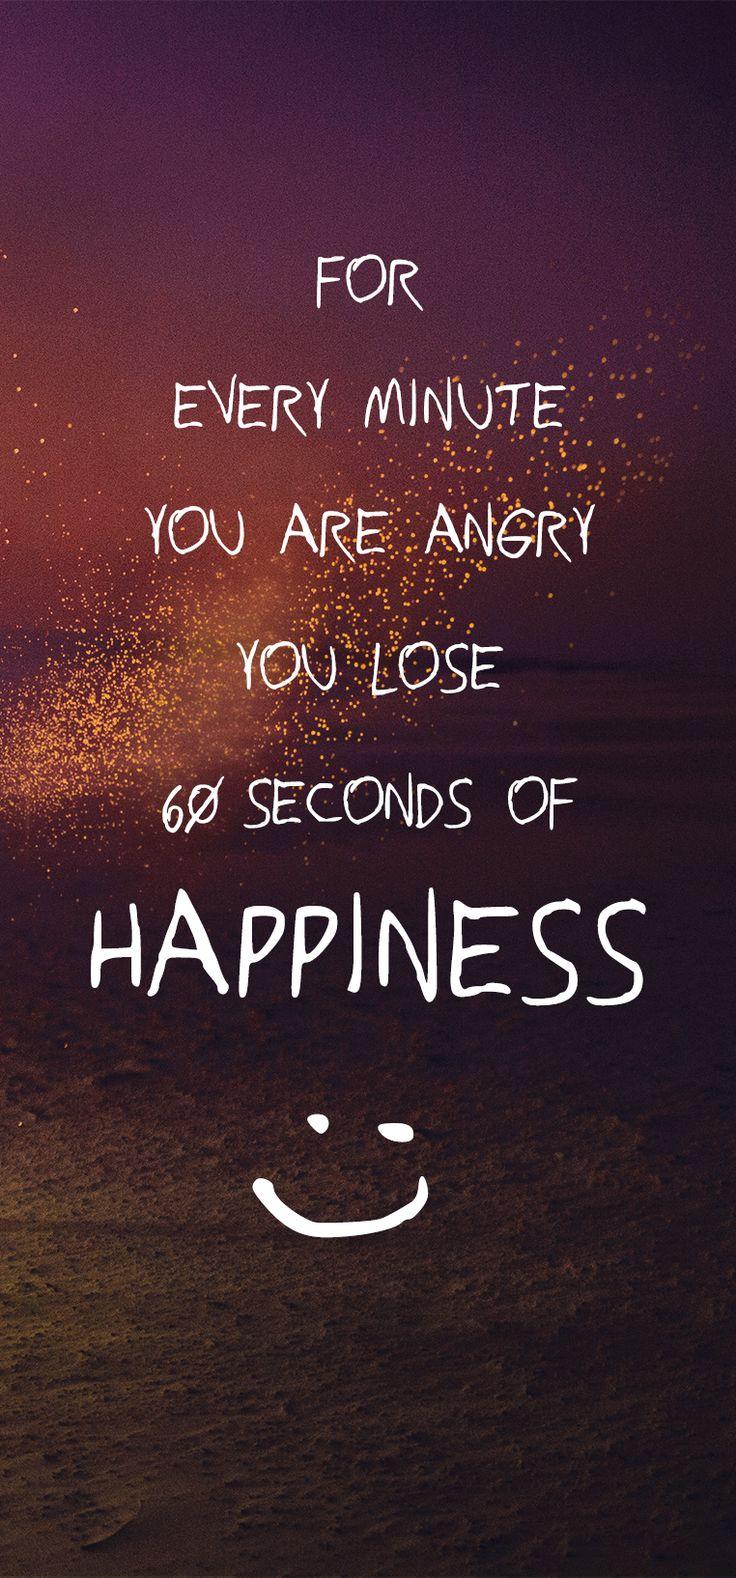 image short meaningful quotes - photo #45